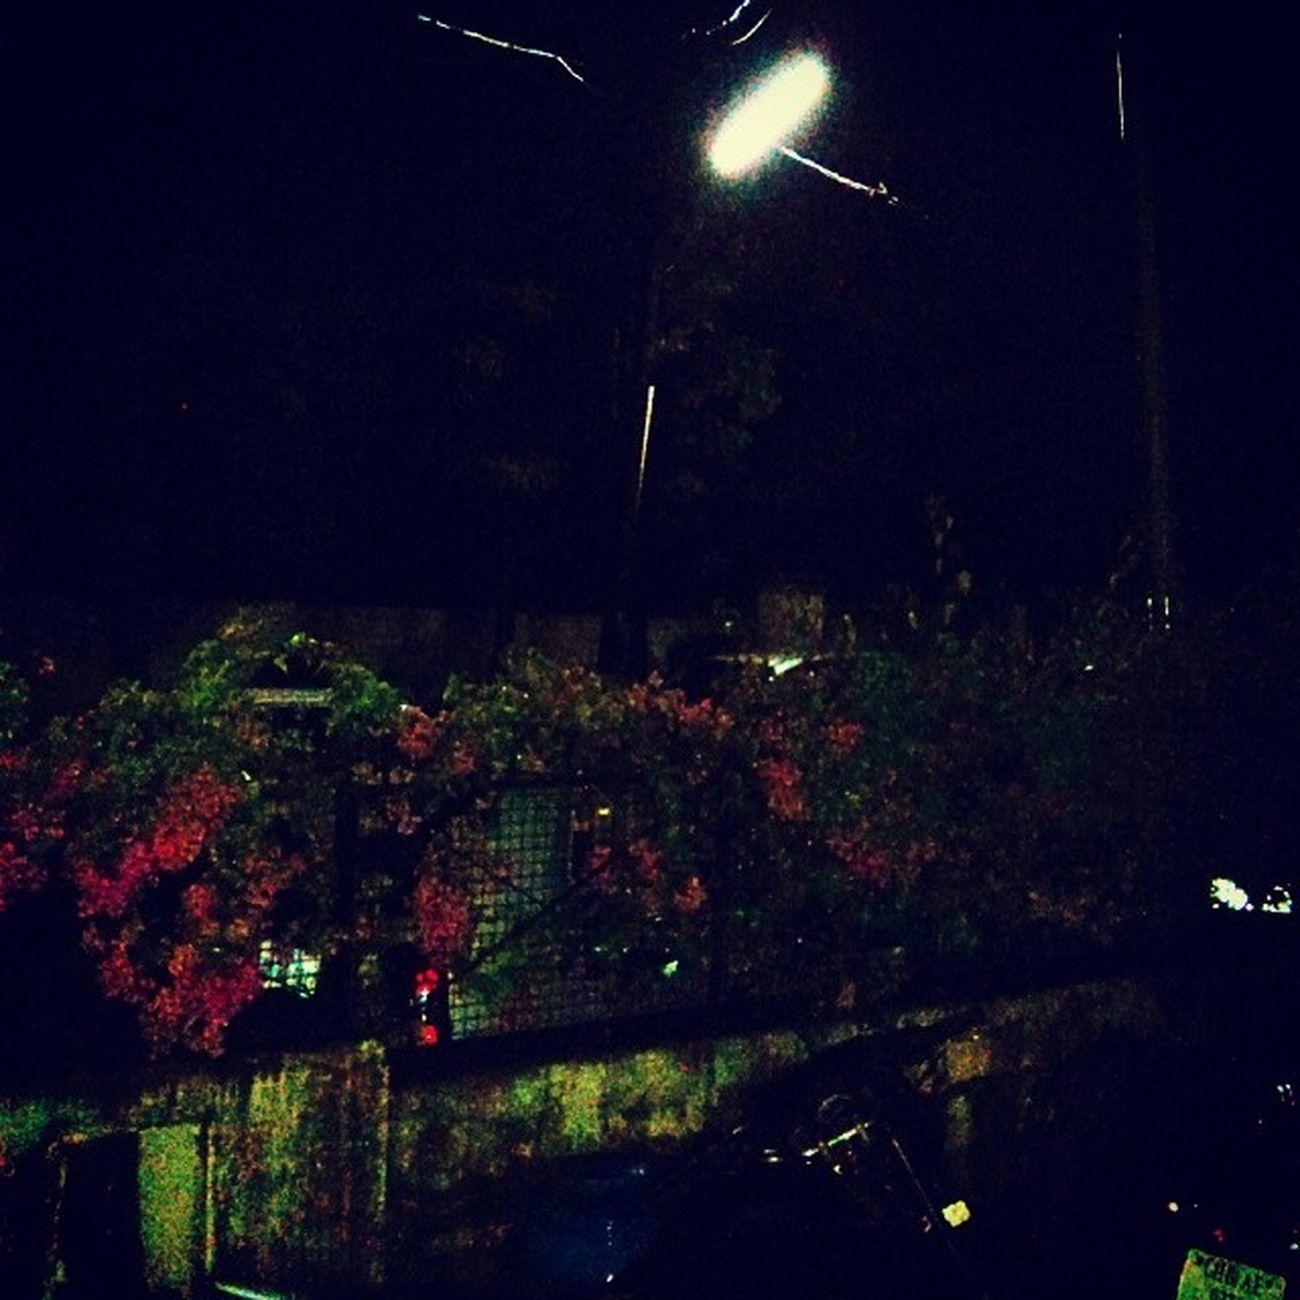 Rain night Downpour Heavy Rain Cold weather chandigarh instapic